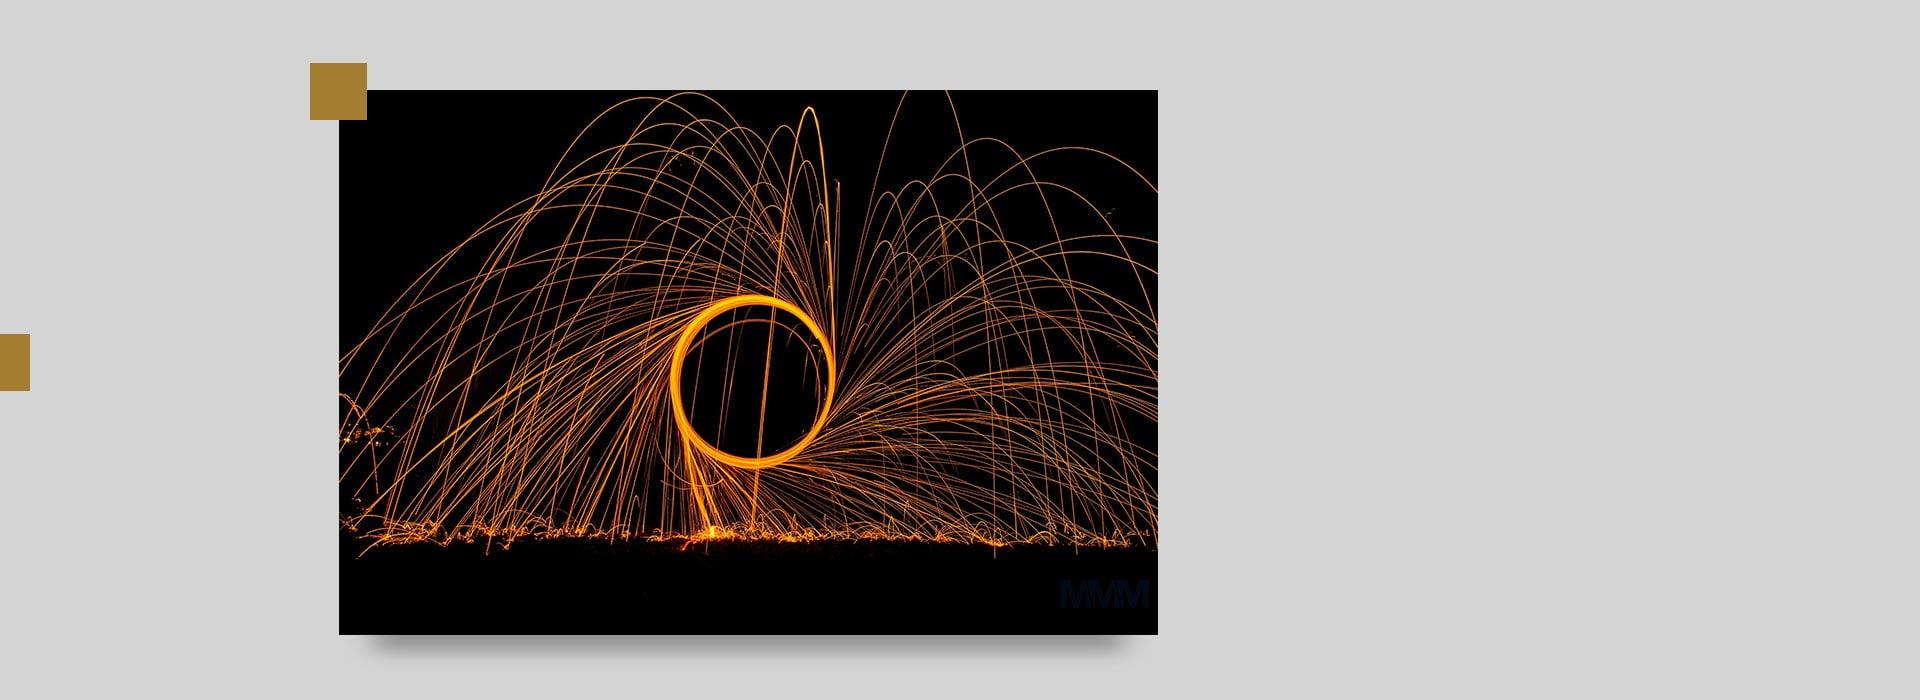 flashlight night photography - عکاسی در شب